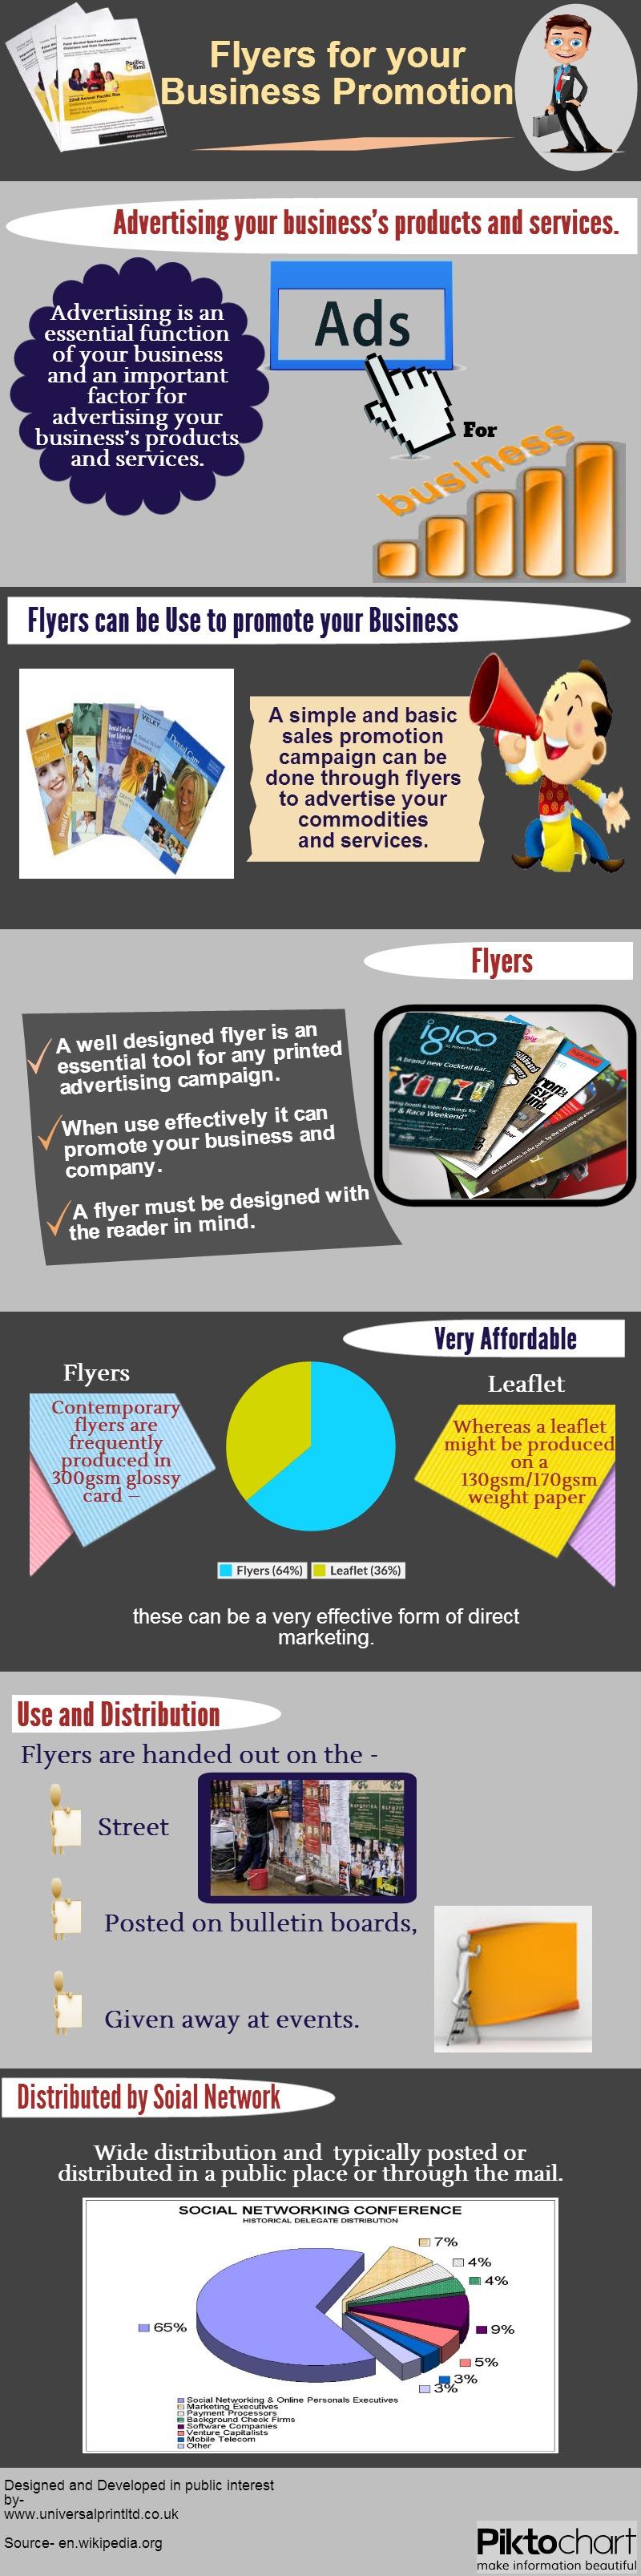 Usa flyers para promocionar tu empresa